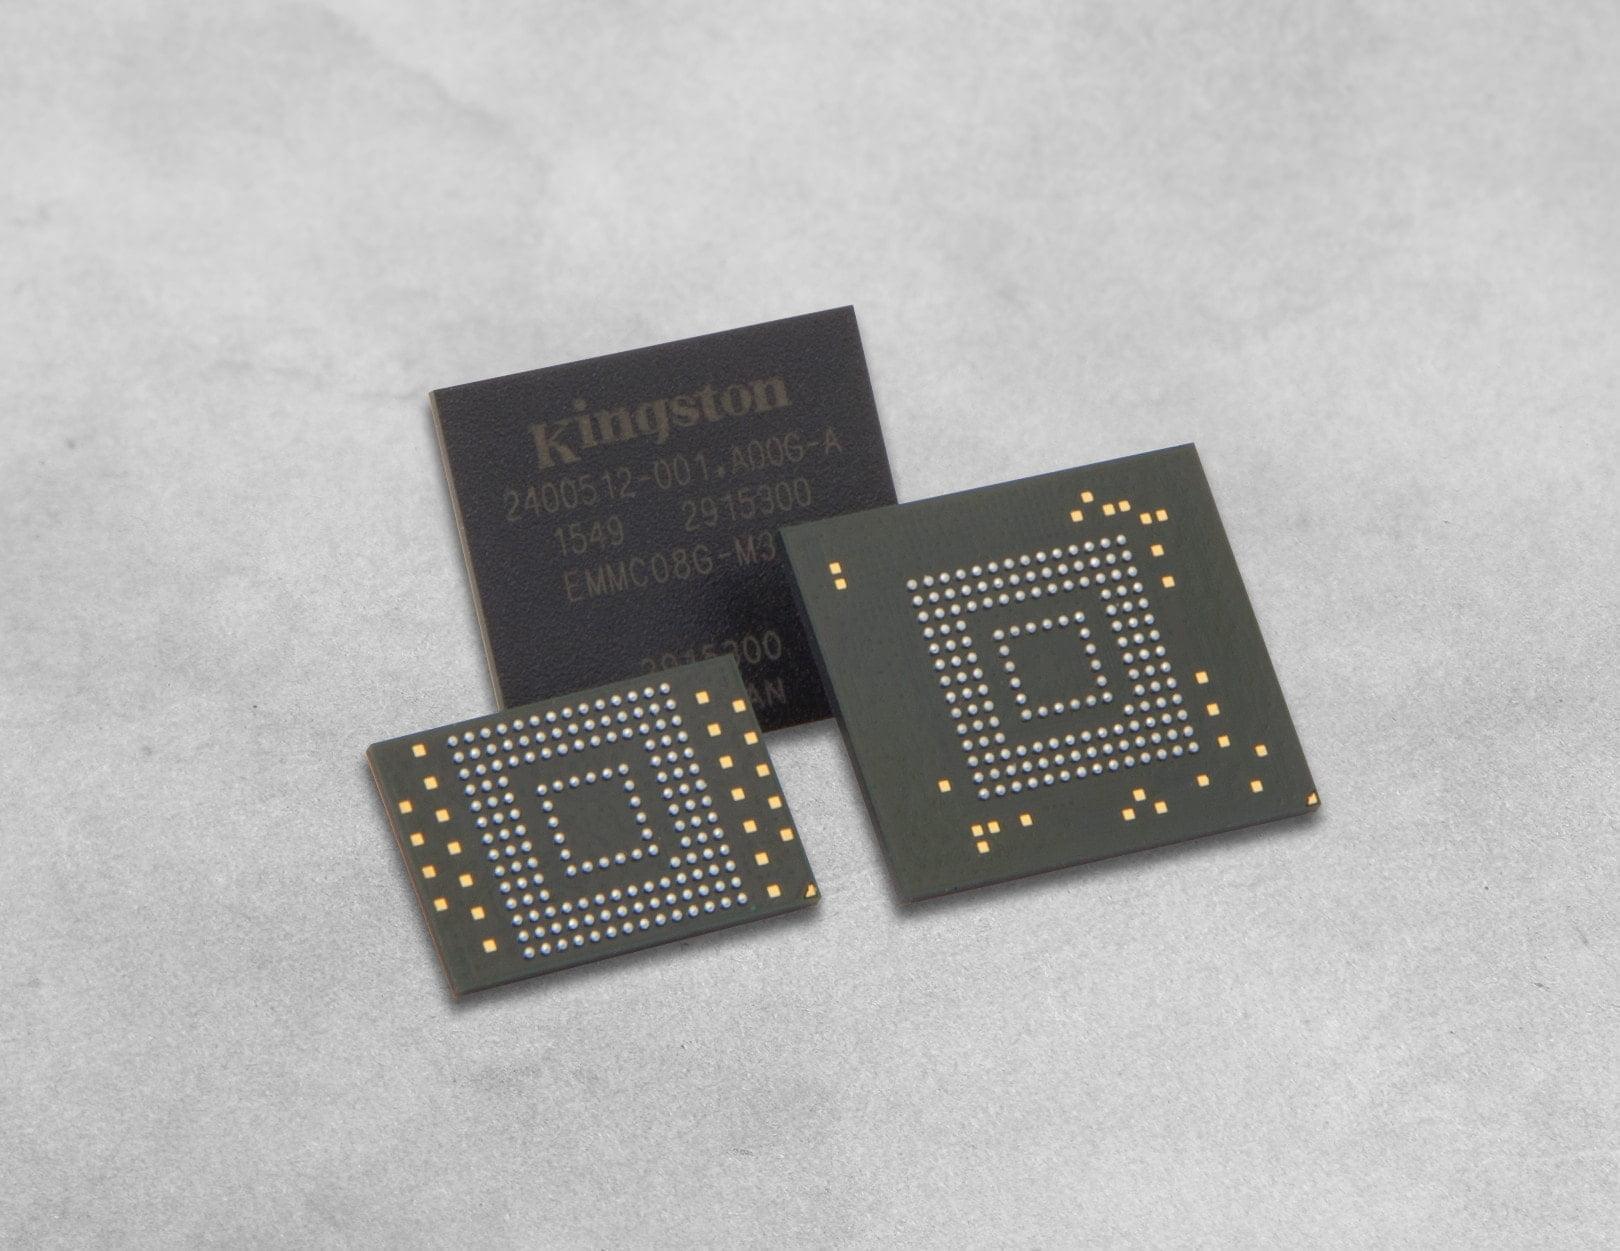 Kingston hợp tác NXP để phát triển Bộ vi xử lý i.MX 8M Plus